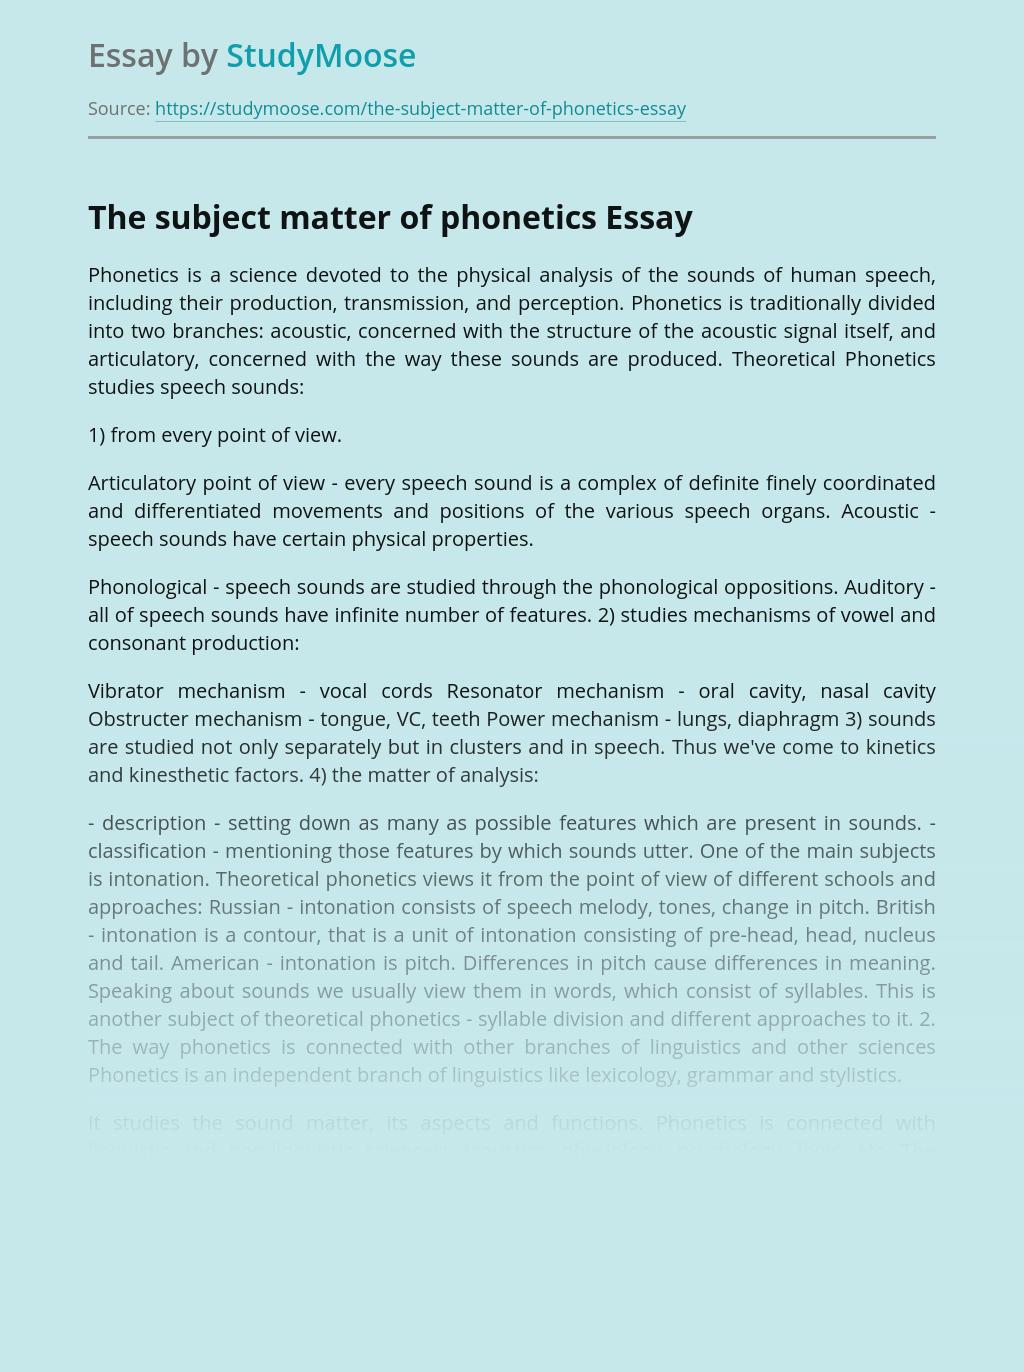 The subject matter of phonetics